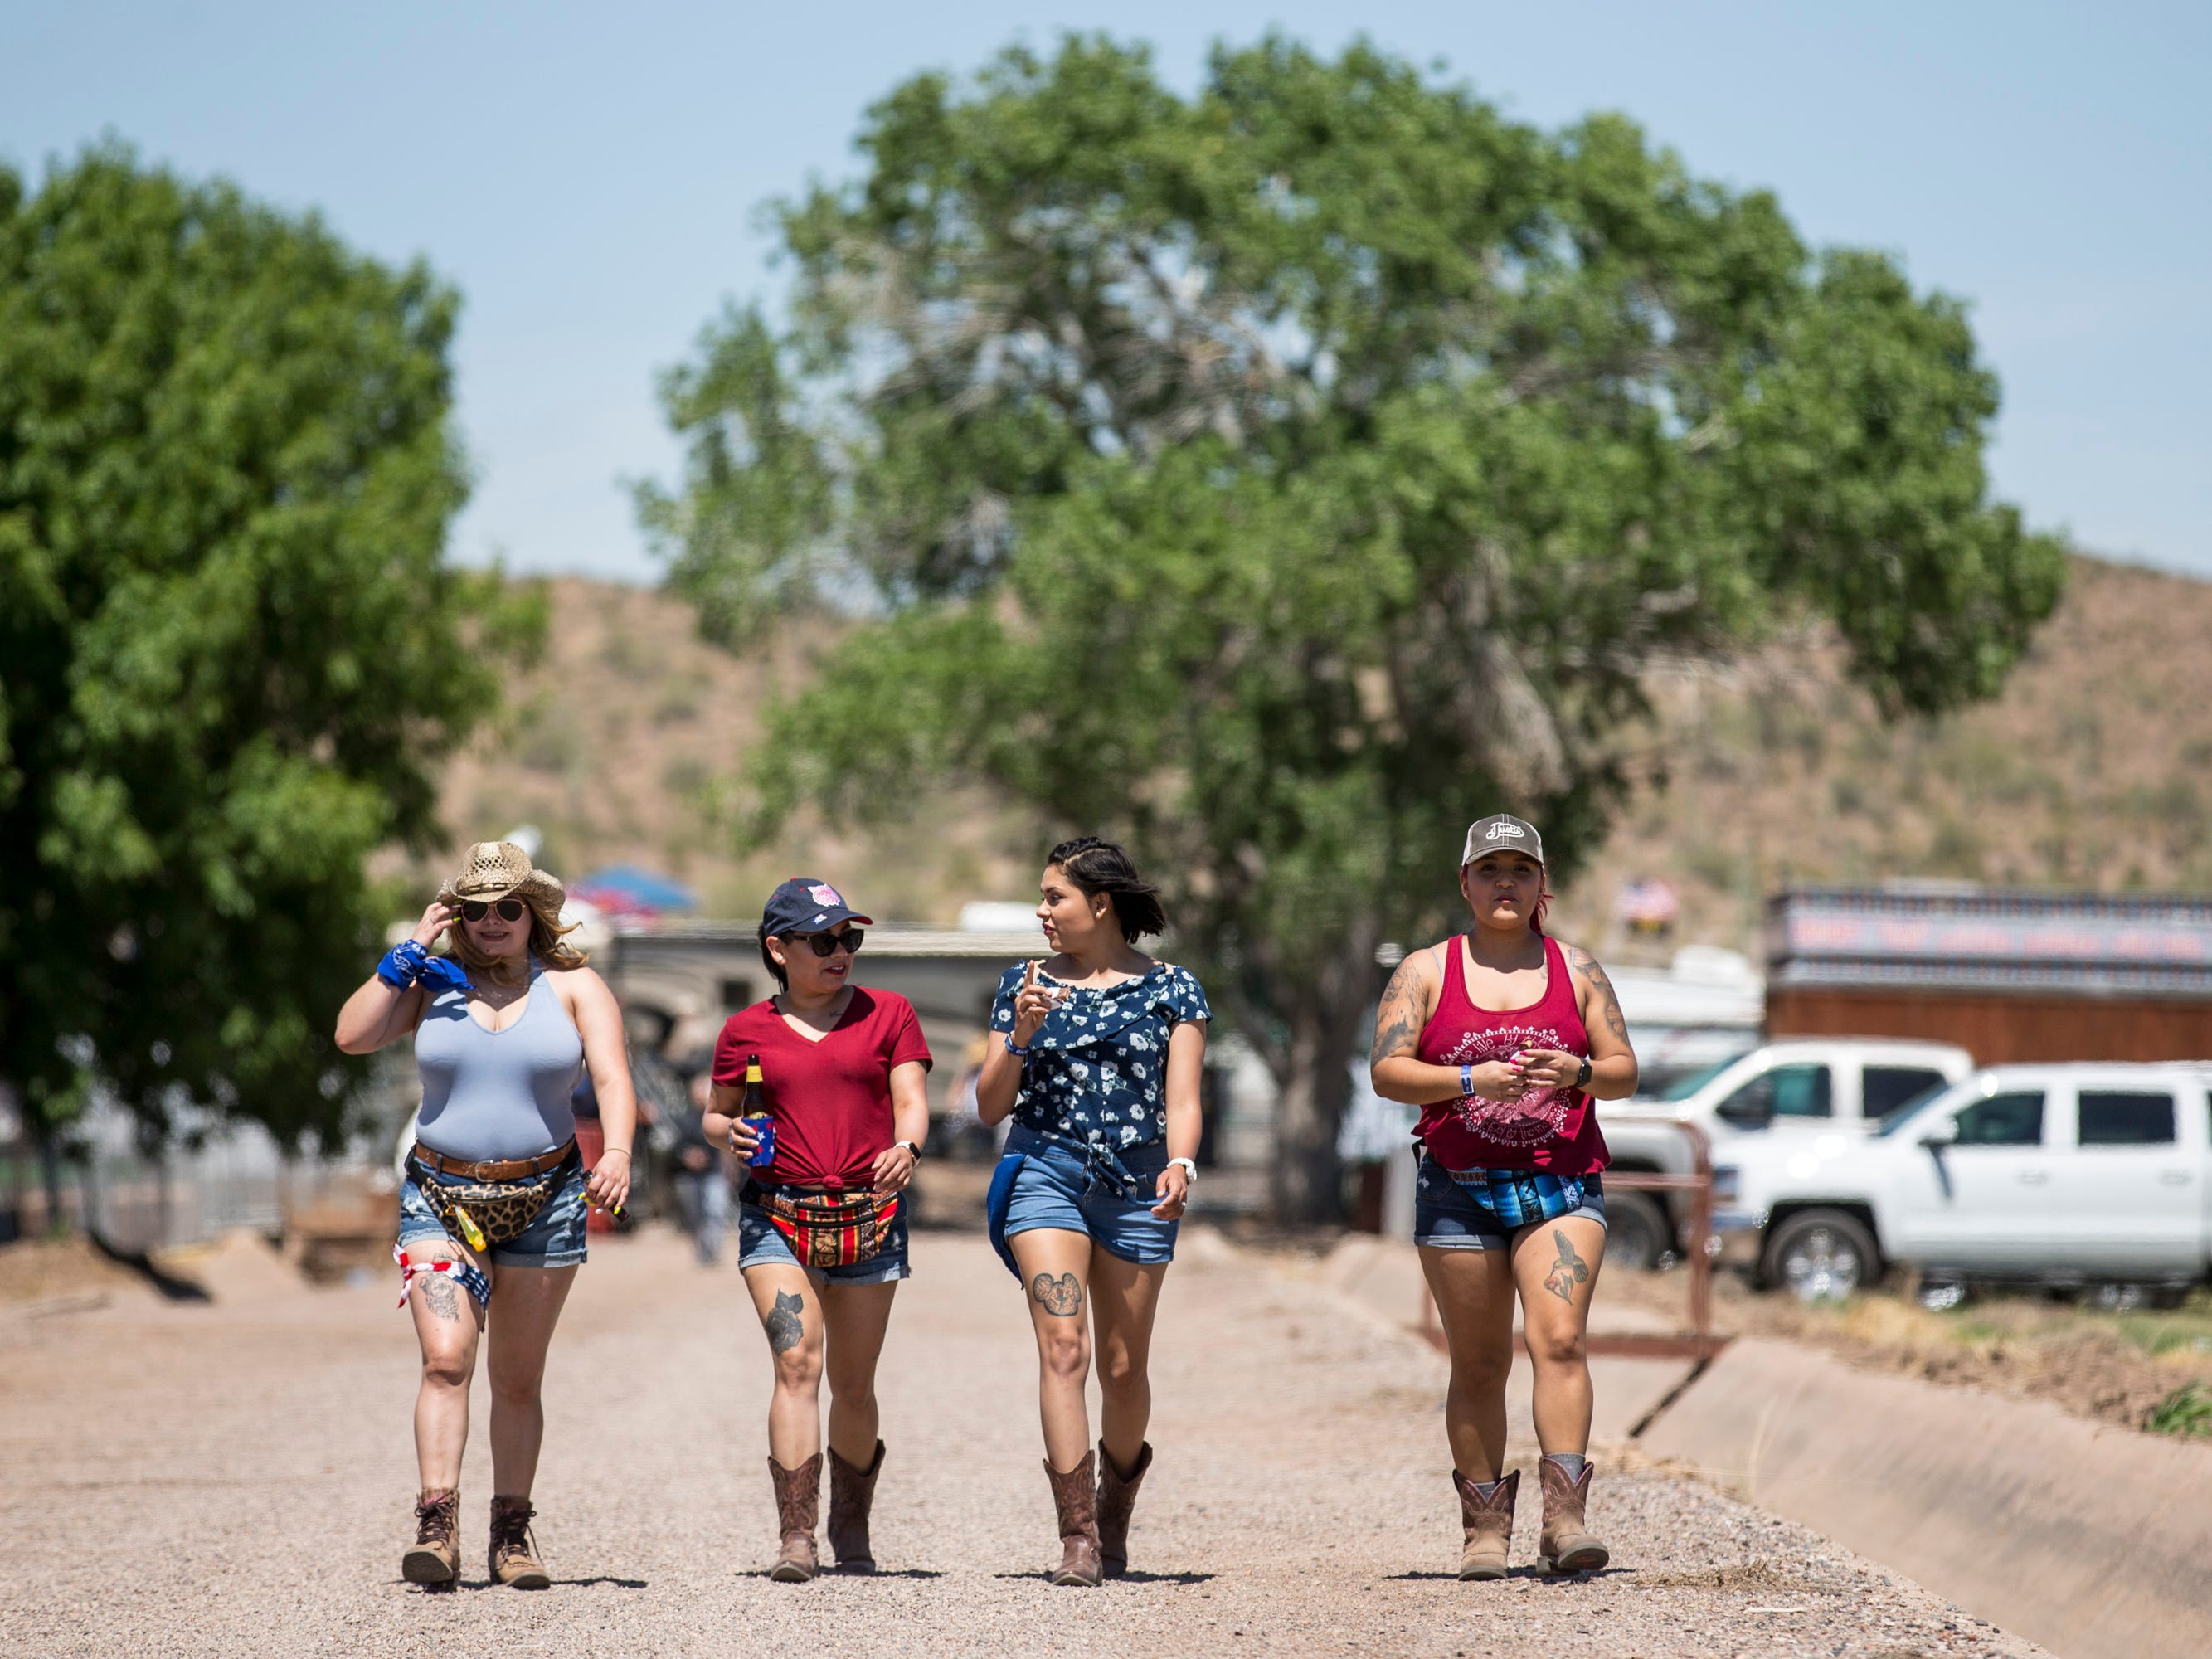 Brianda Arvayo (from left), Angela Perez, Marcela Avalos and Maria Borquez walk around April 11, 2019, during Day 1 of Country Thunder Arizona in Florence.